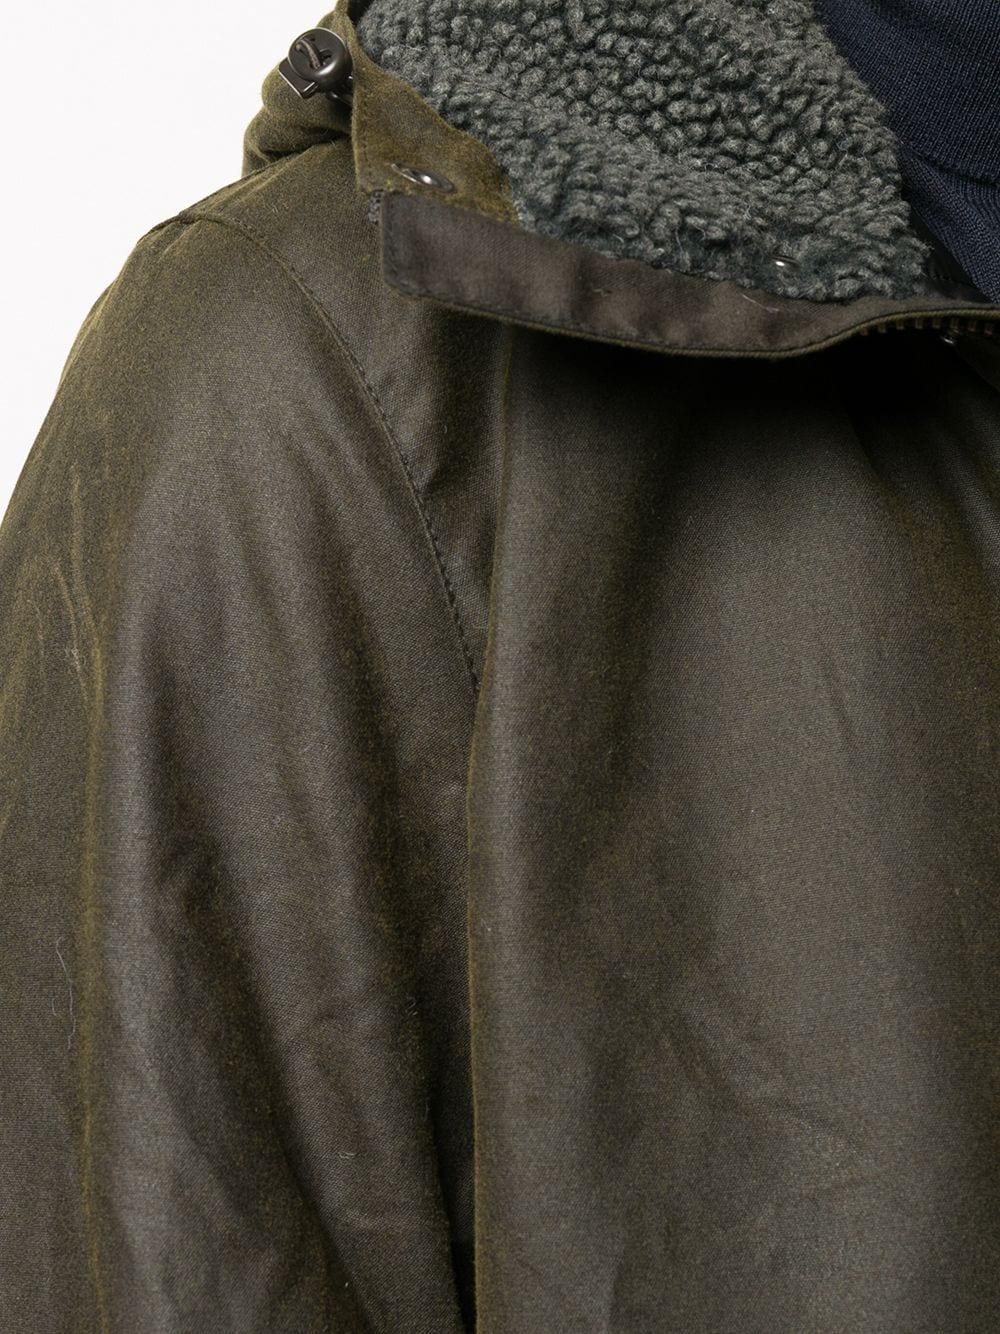 waterproof jacket man olive in cotton BARBOUR | Jackets | MWX1372OL51